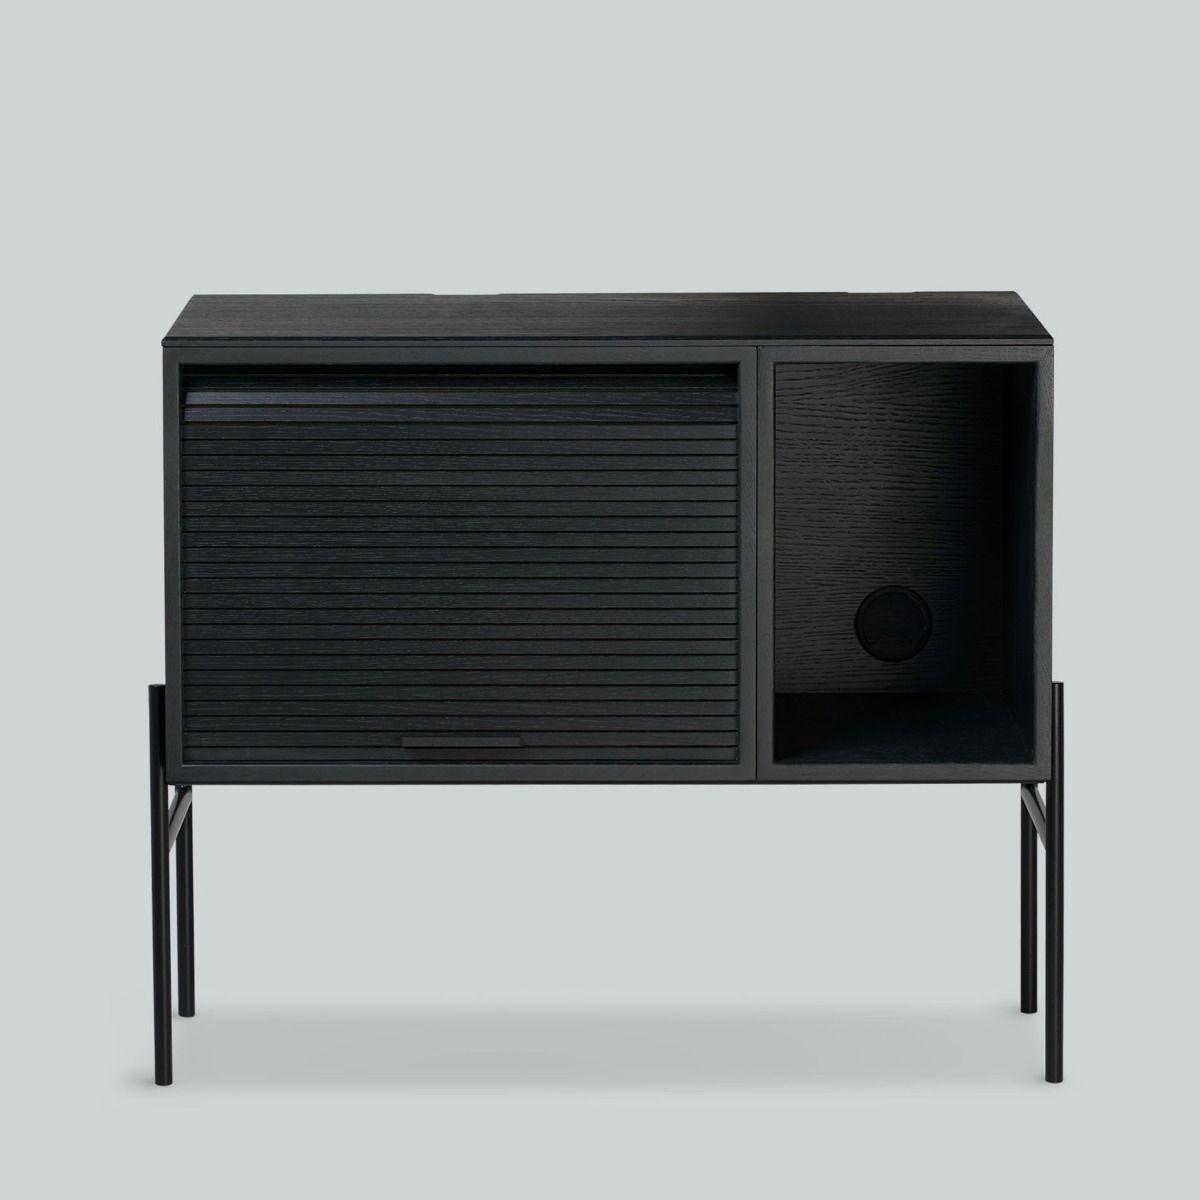 Northern Hifive Cabinet - 75